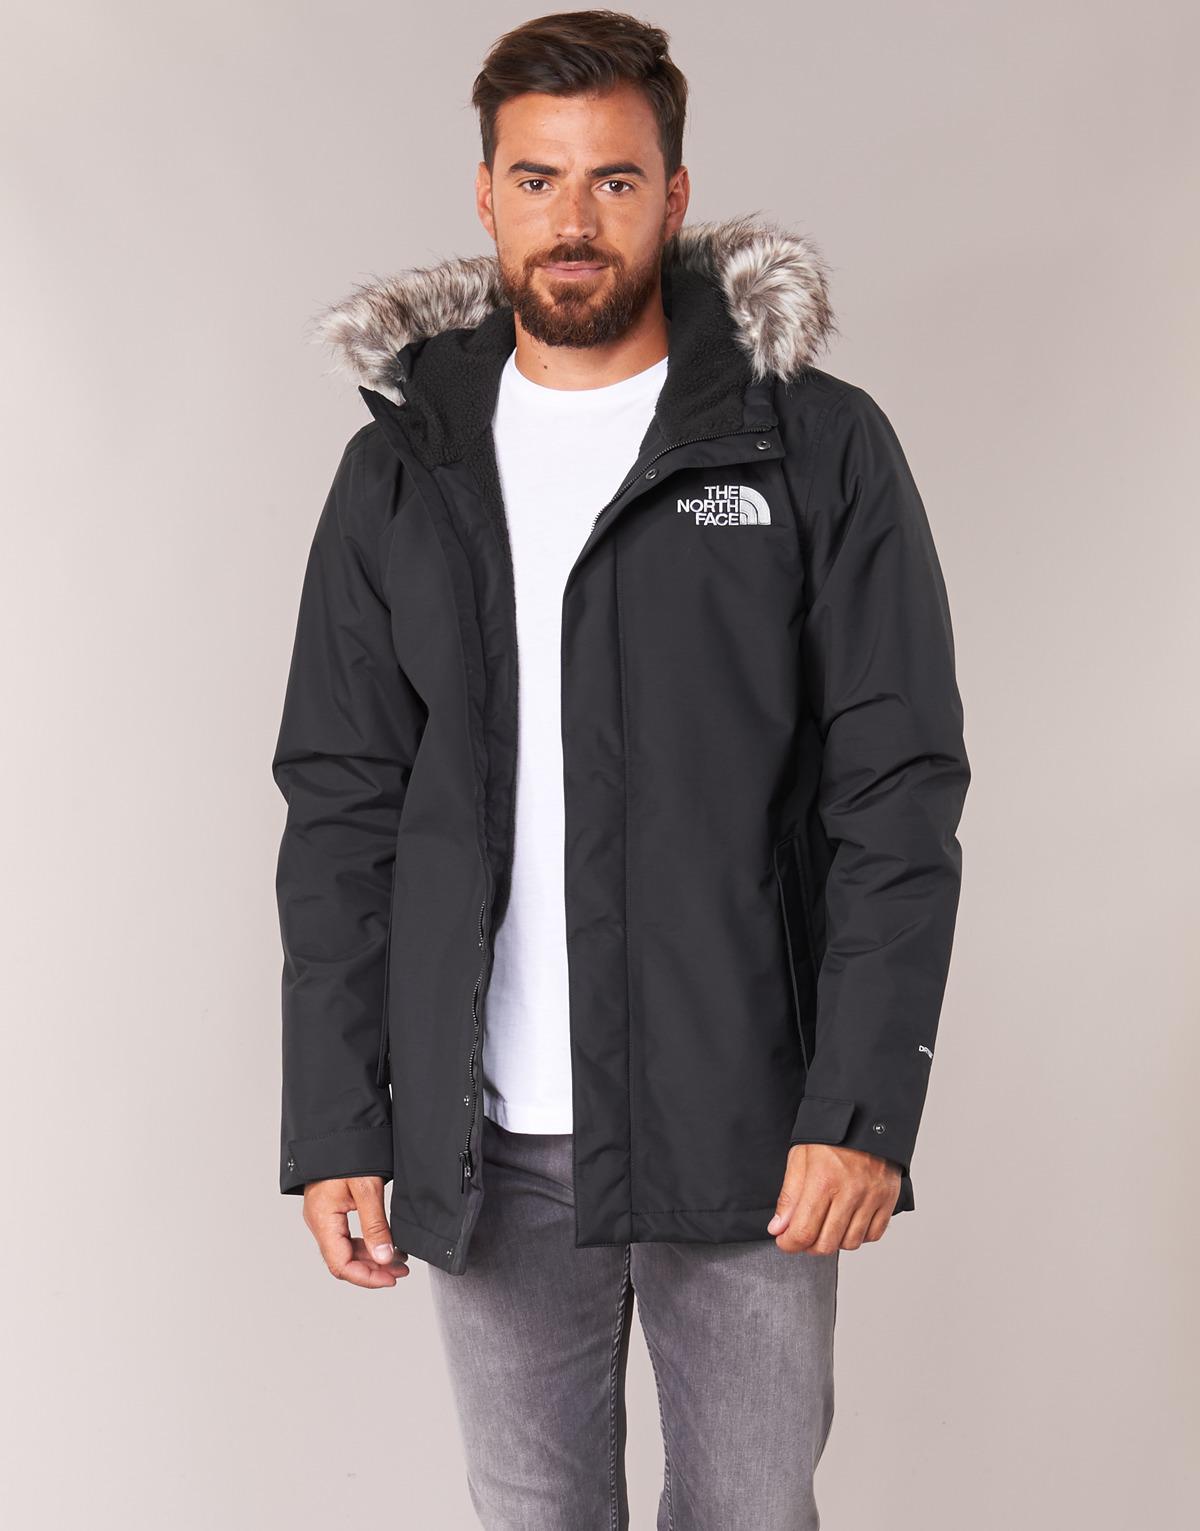 6a96c5cf1 The North Face Sherpa Zaneck Jacket Men's Parka In Black for Men - Lyst